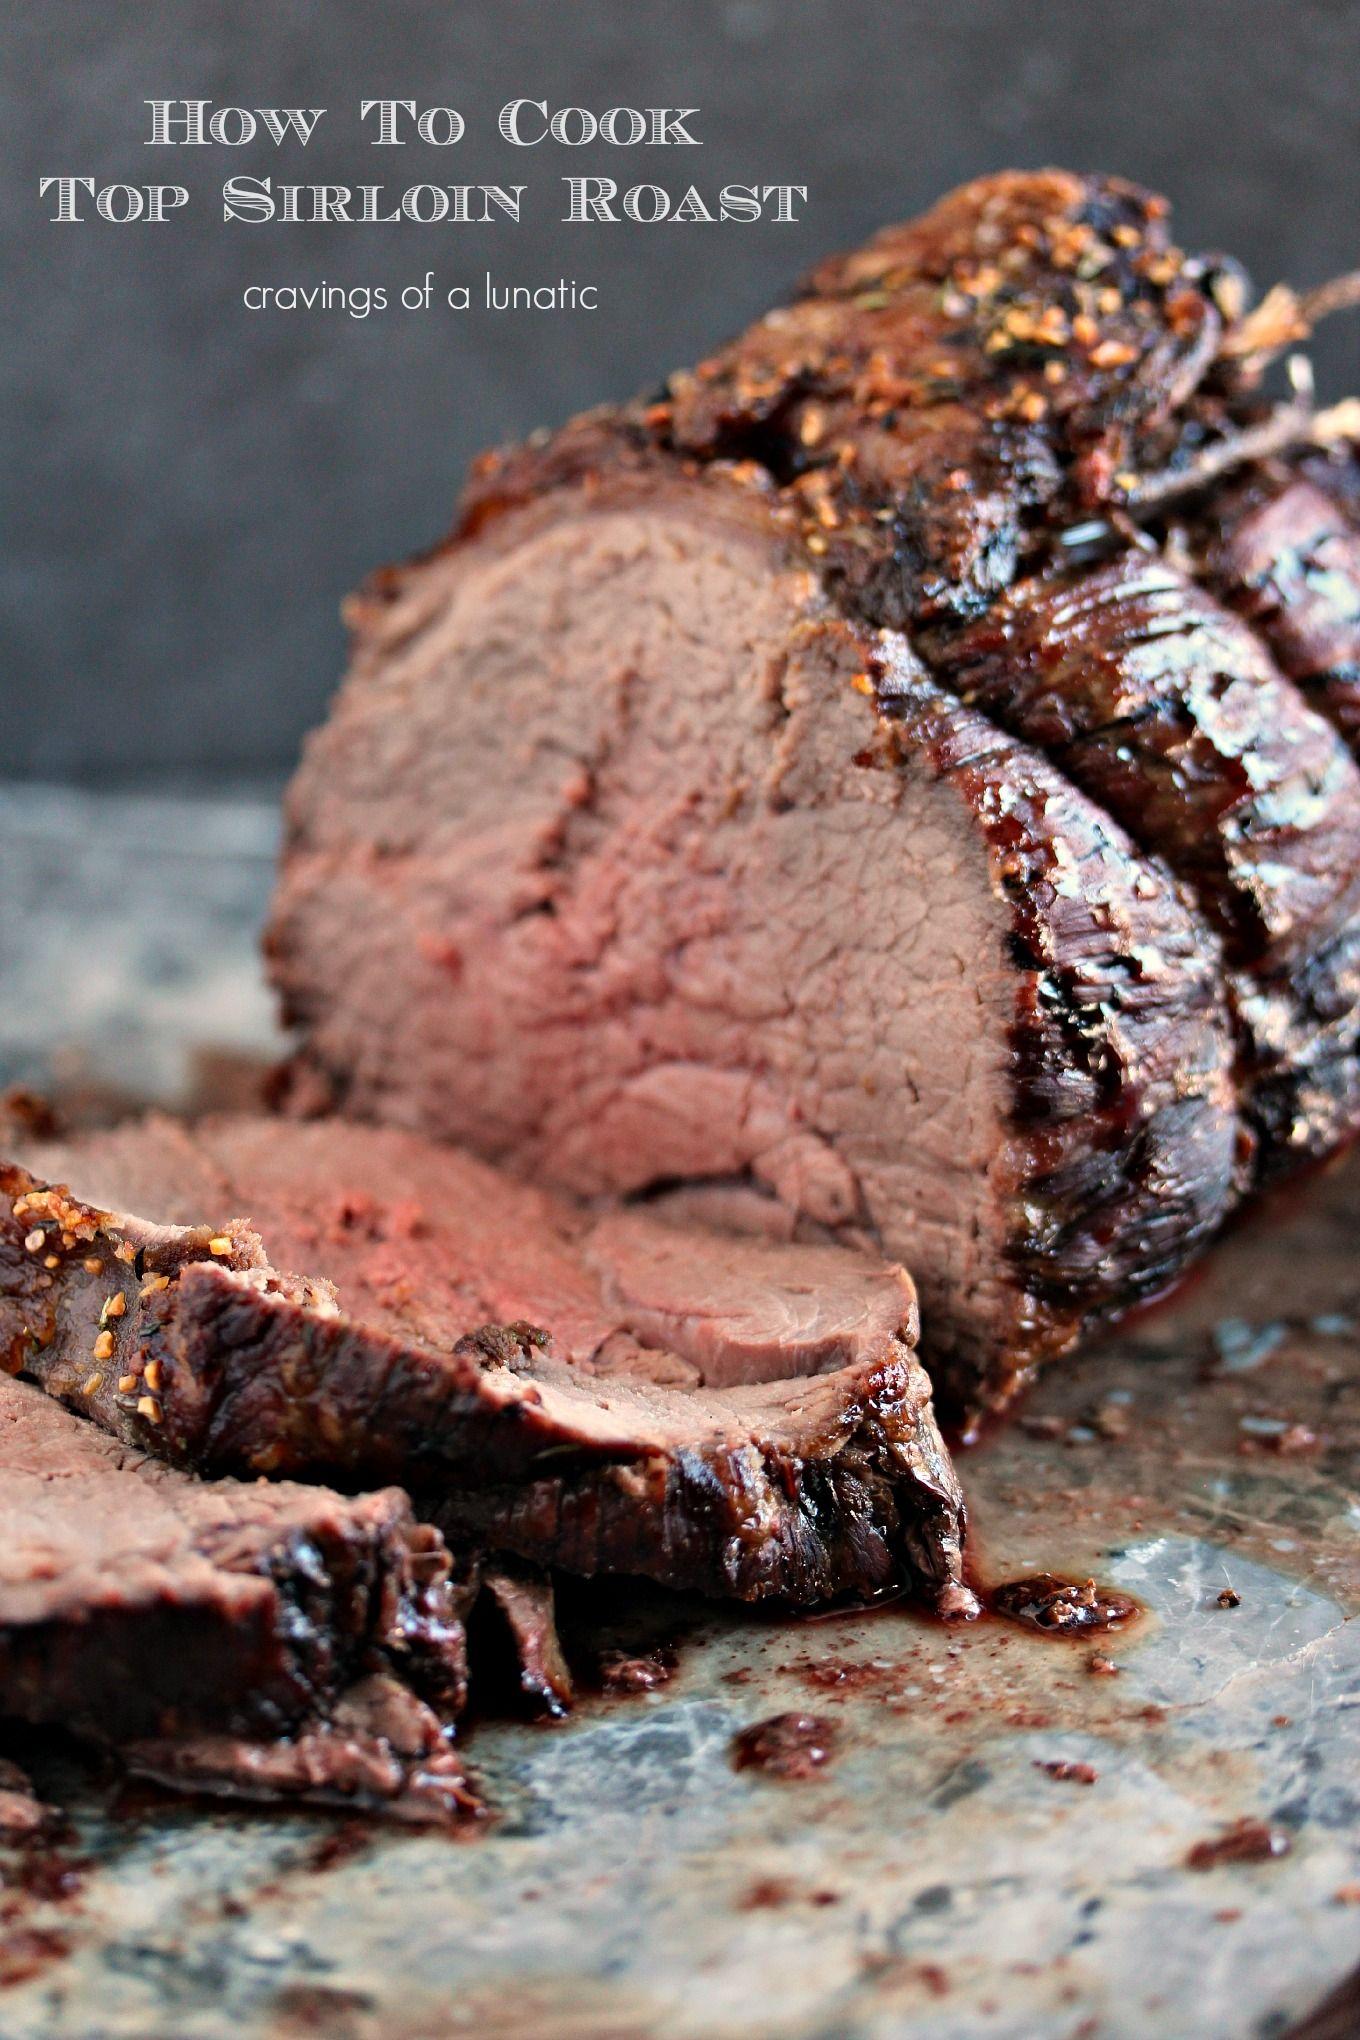 Beef Roast Recipe Made From Pinterest Roast Beef Recipes Sirloin Roast Recipes Recipes